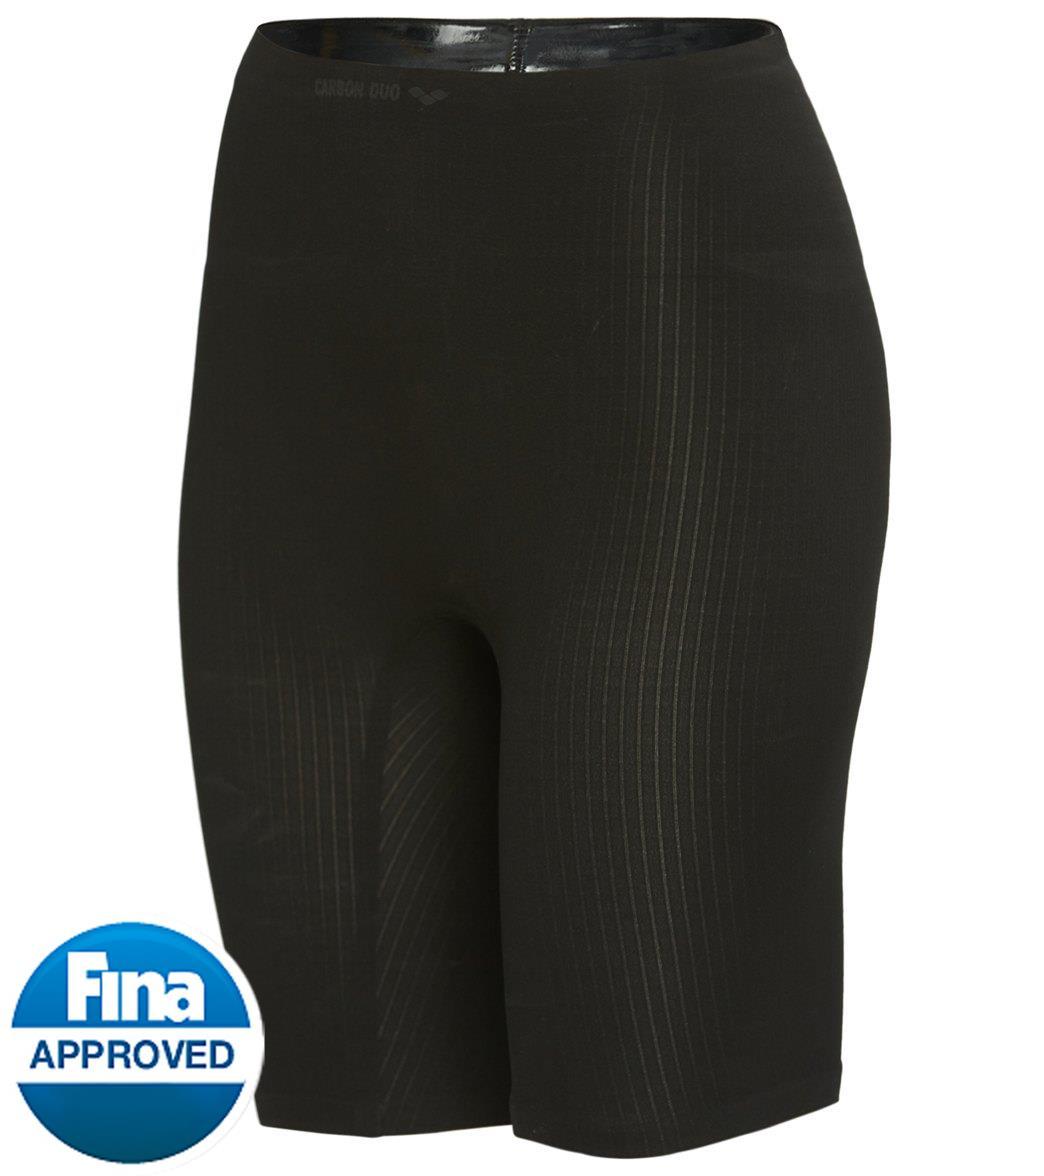 Arena Women's Powerskin Carbon Duo Jammer Tech Suit Swimsuit